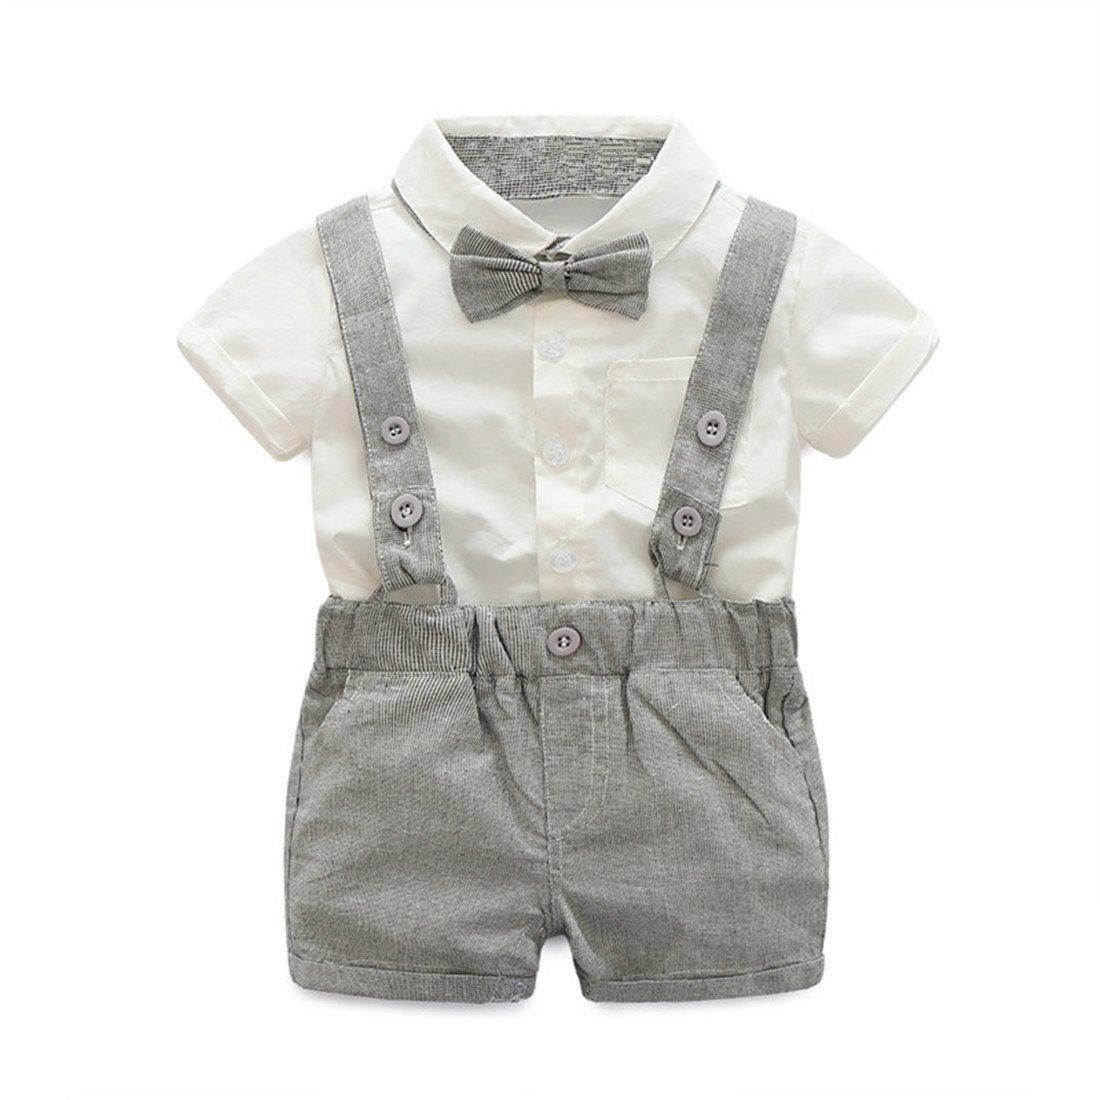 Baby Boy 2Pcs Gentleman Bow Tie Cotton T-shirt Suspenders Shorts Set (6-12Months, Grey)